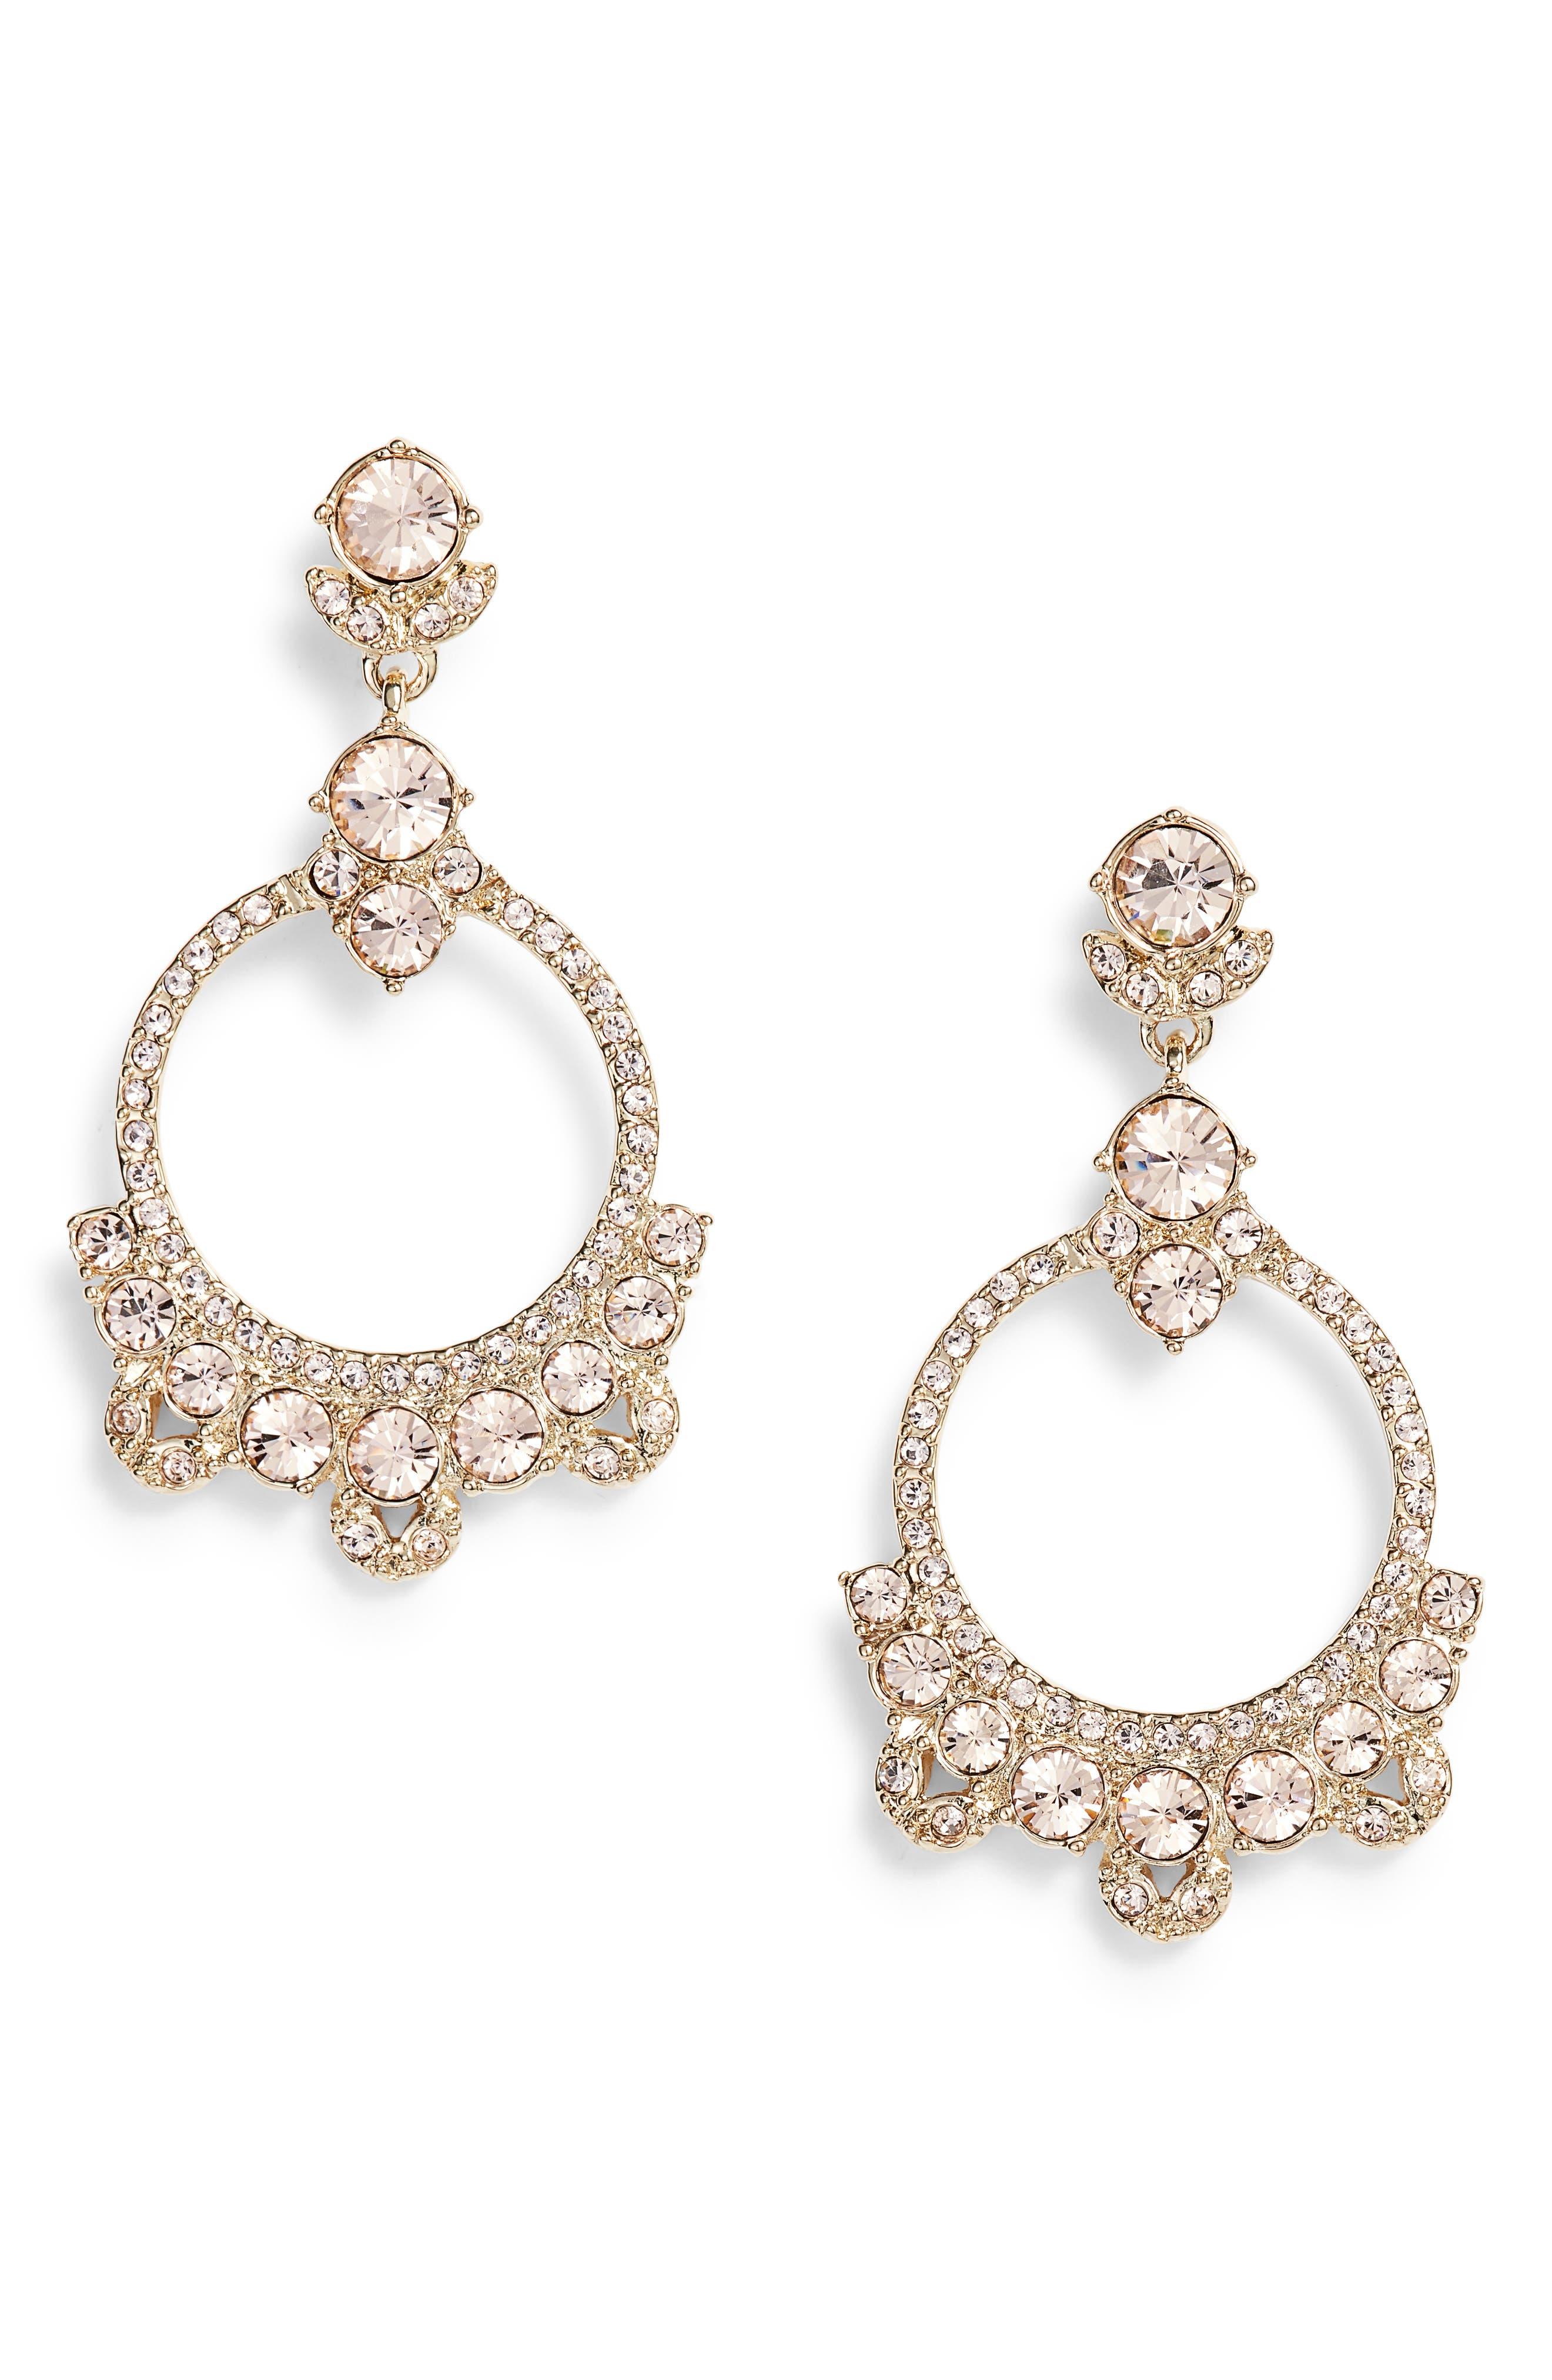 Givenchy Orbital Drop Earrings